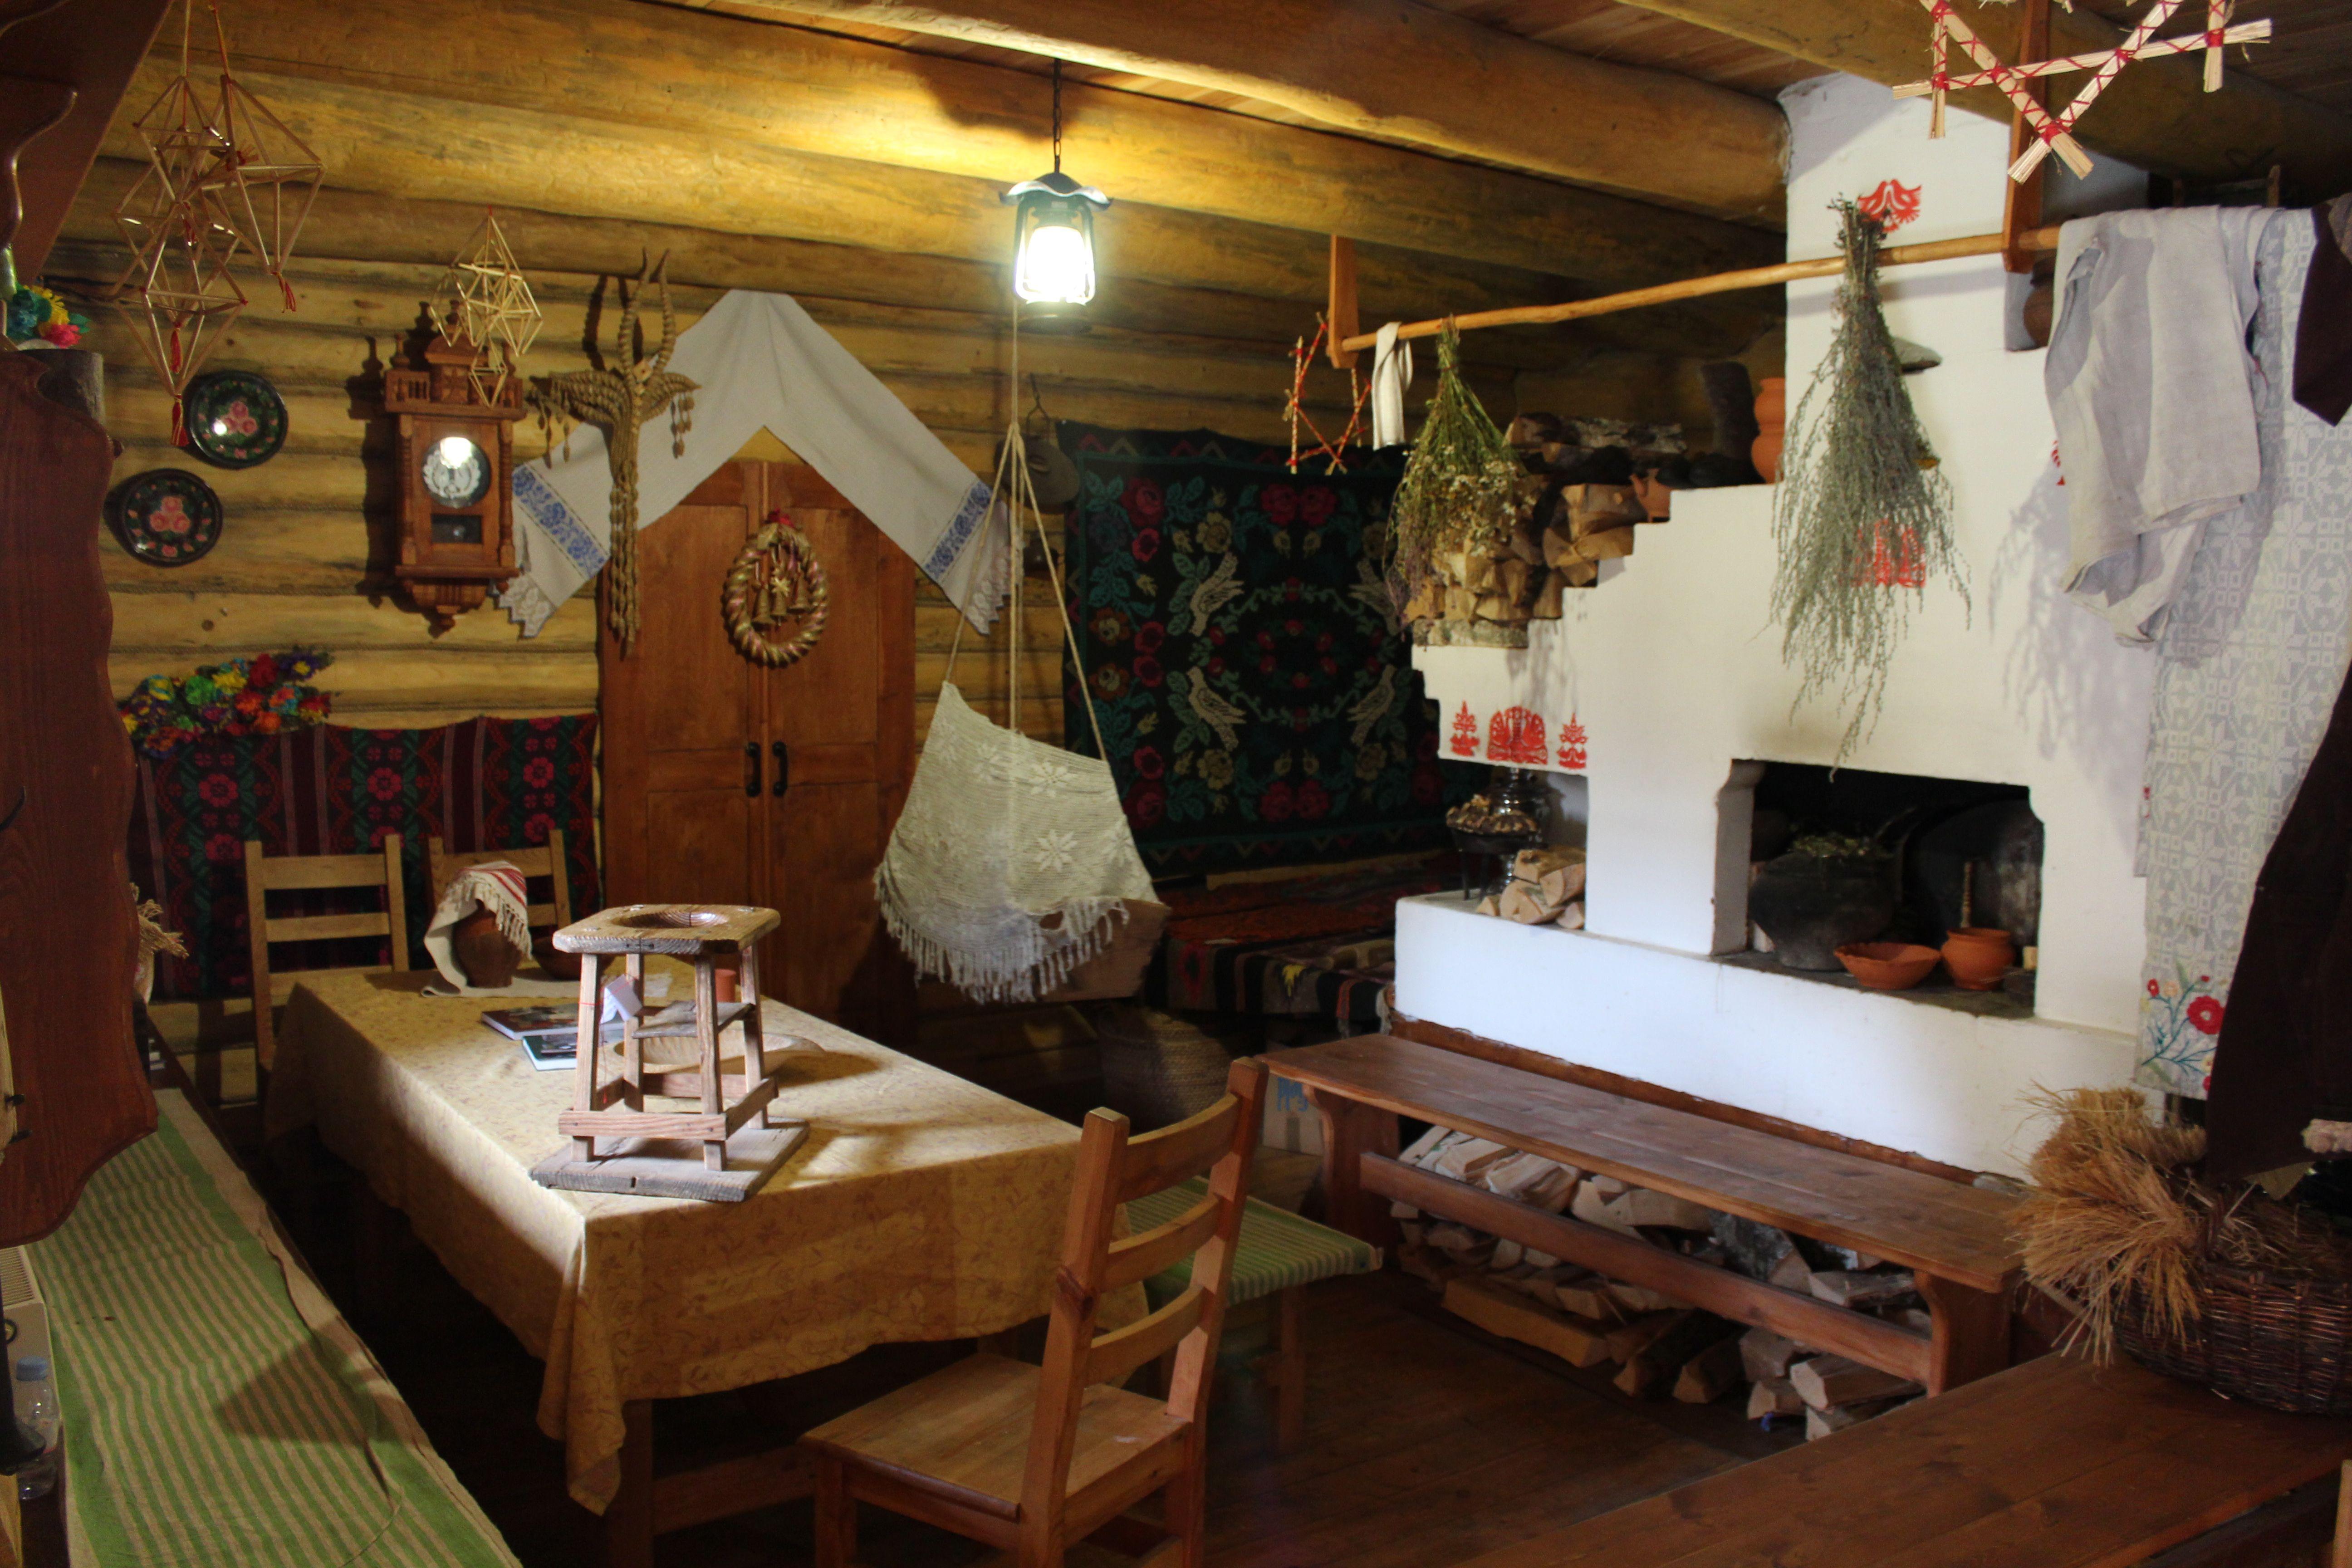 Slavic ethnic home interior   Ethnic dwelling   Pinterest   Interiors